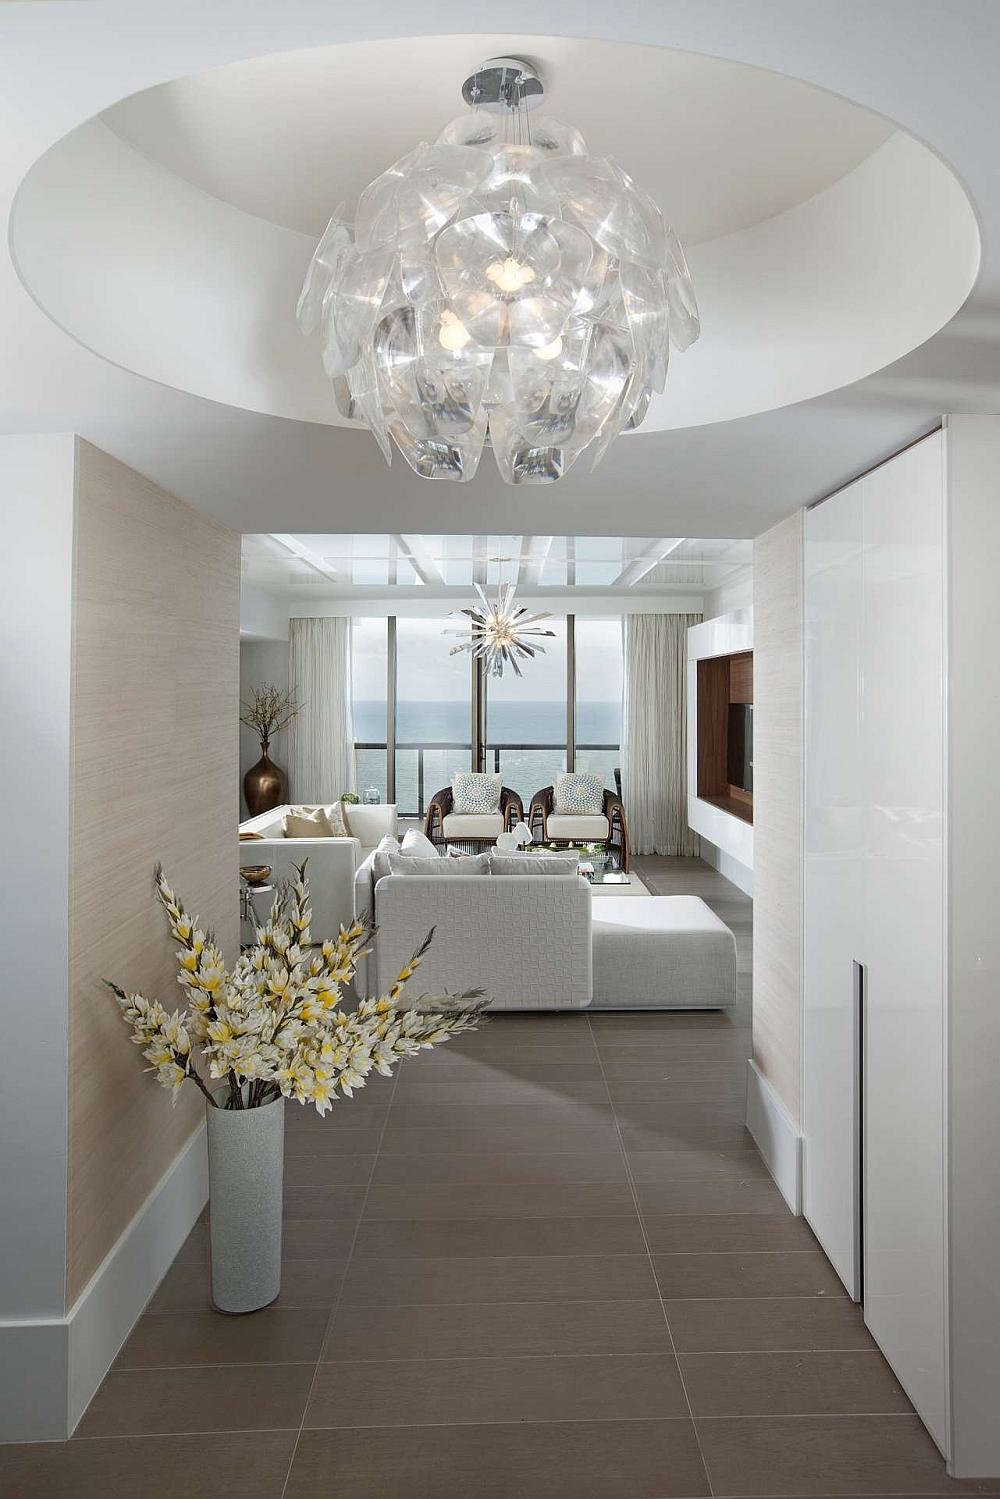 Urbane Miami Home Brings Chic Sophistication To Coastal Style